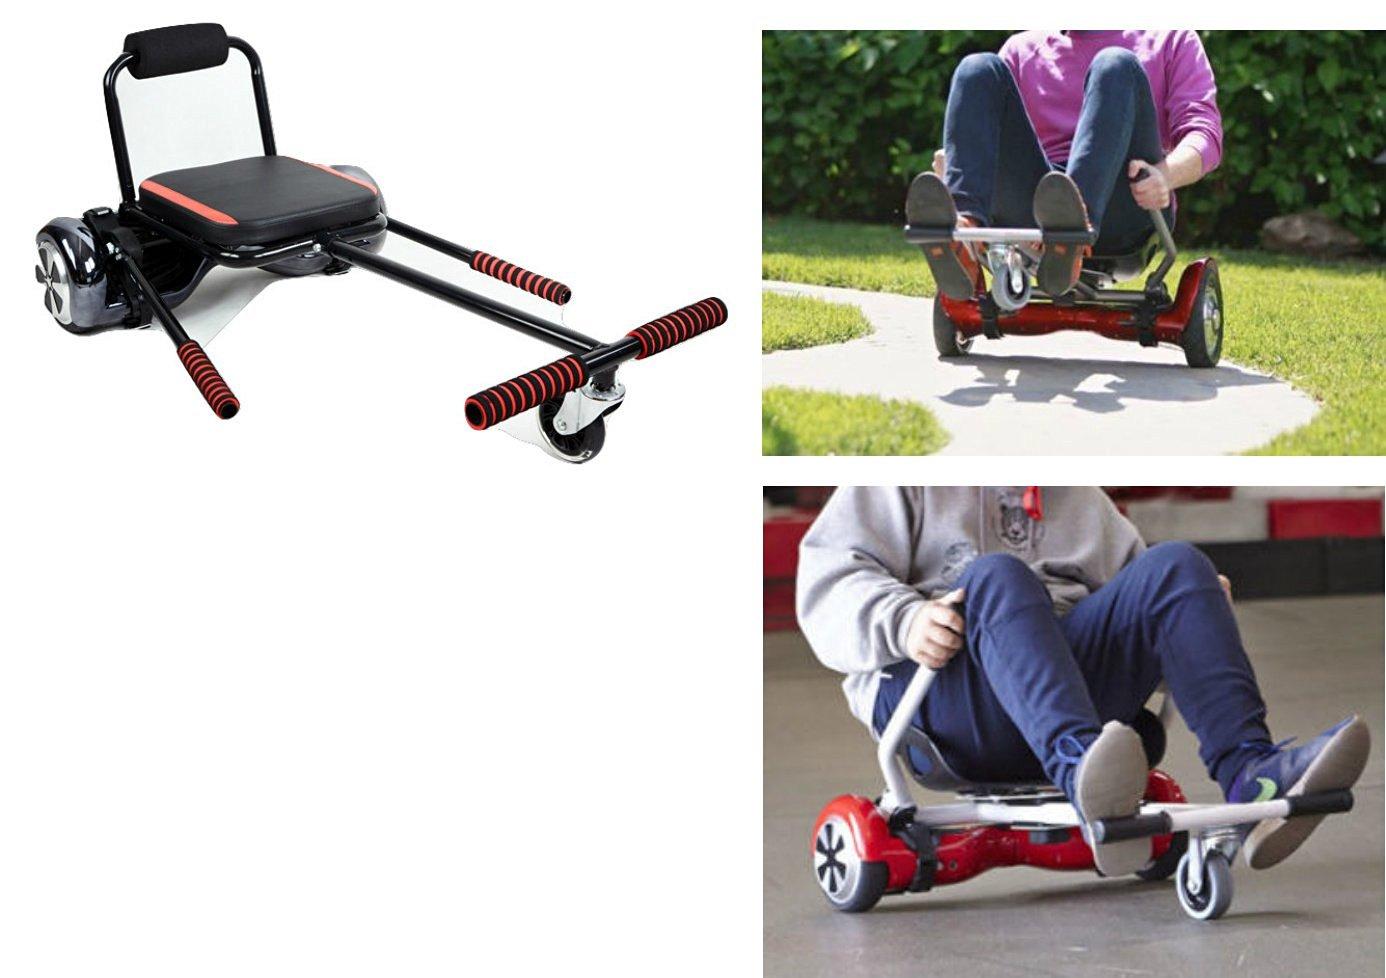 SmartKart™ By Bitronics Gear Transform hoverboard into hoverkart, gocart,